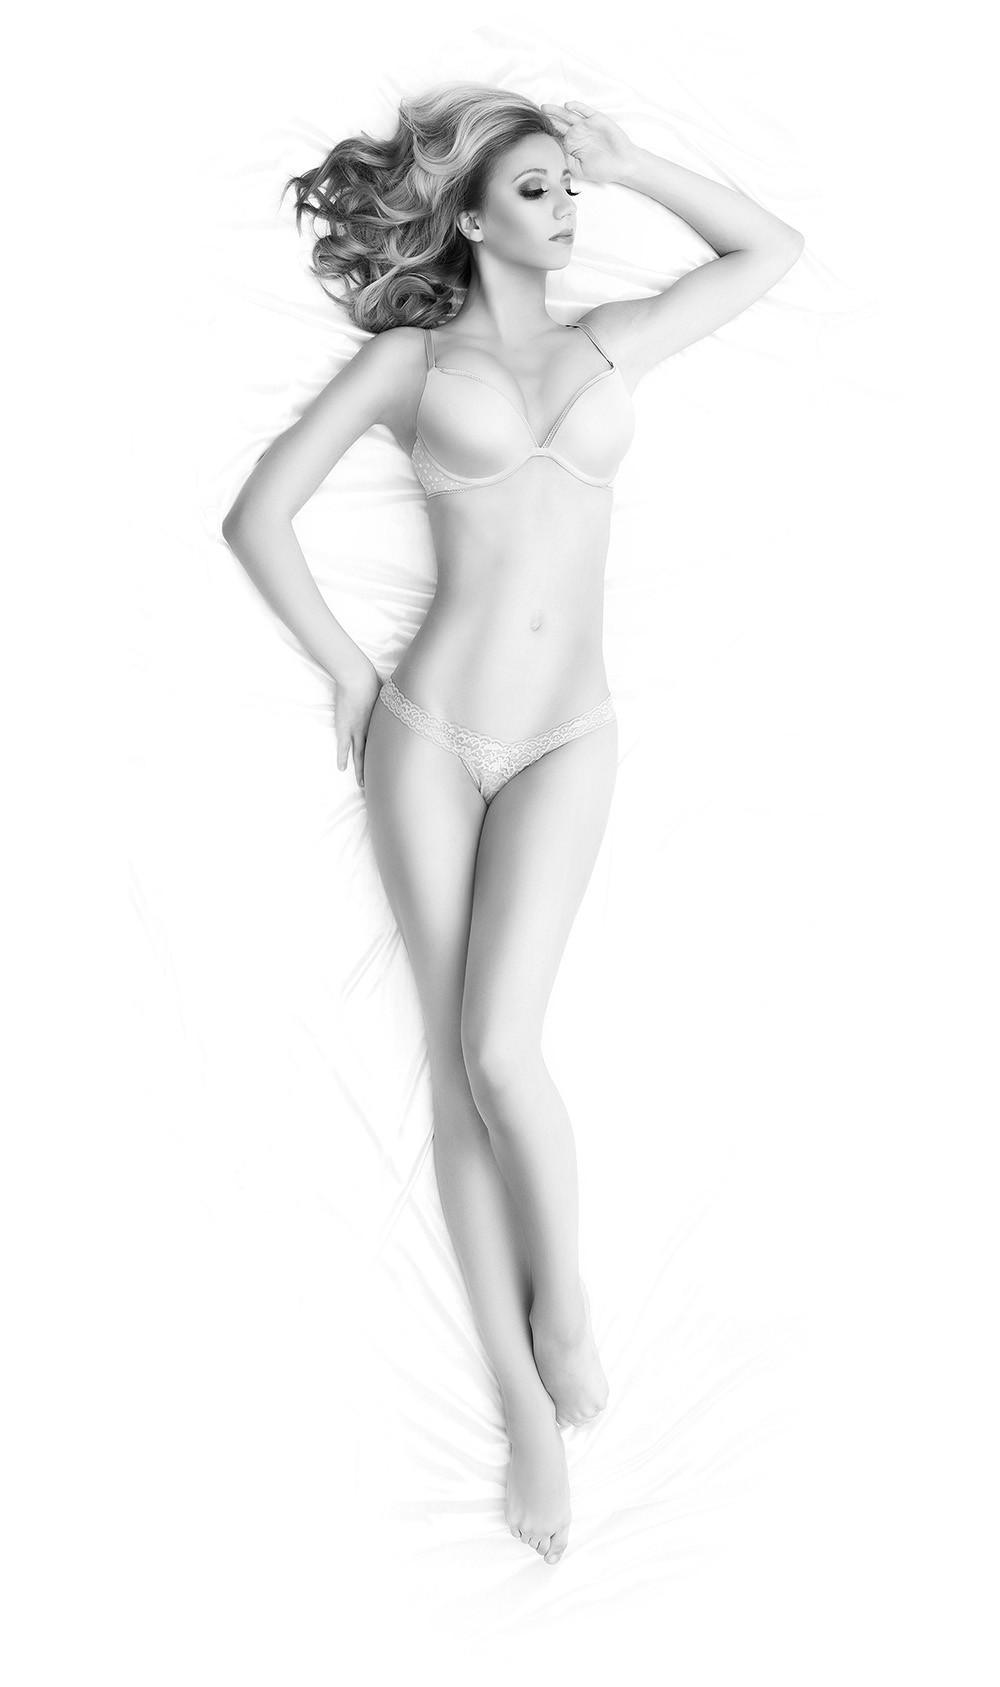 lazer-liposuction.jpg